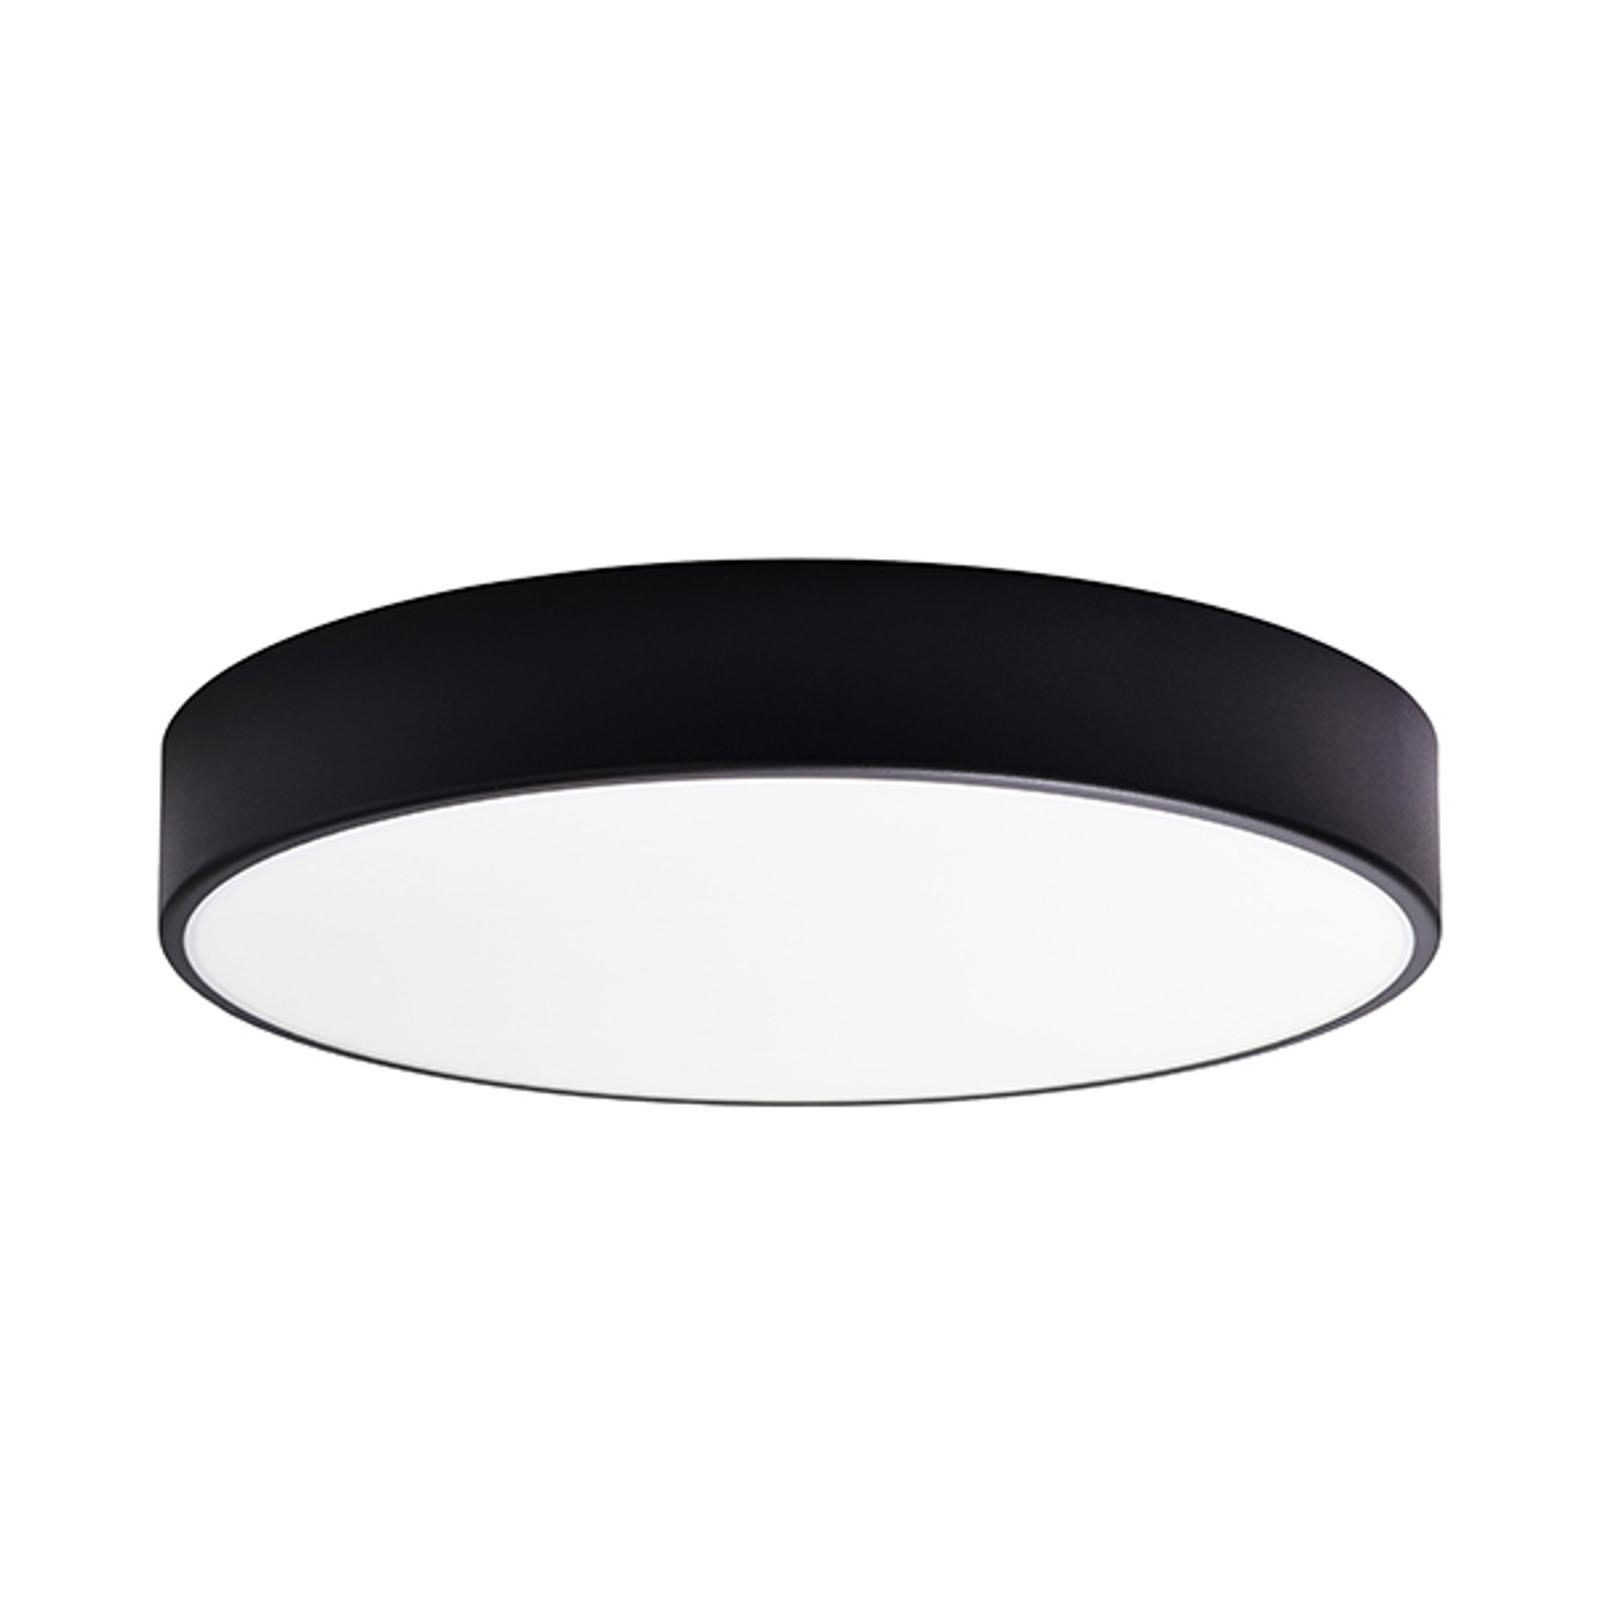 Taklampe Cleo, Ø 50 cm, svart